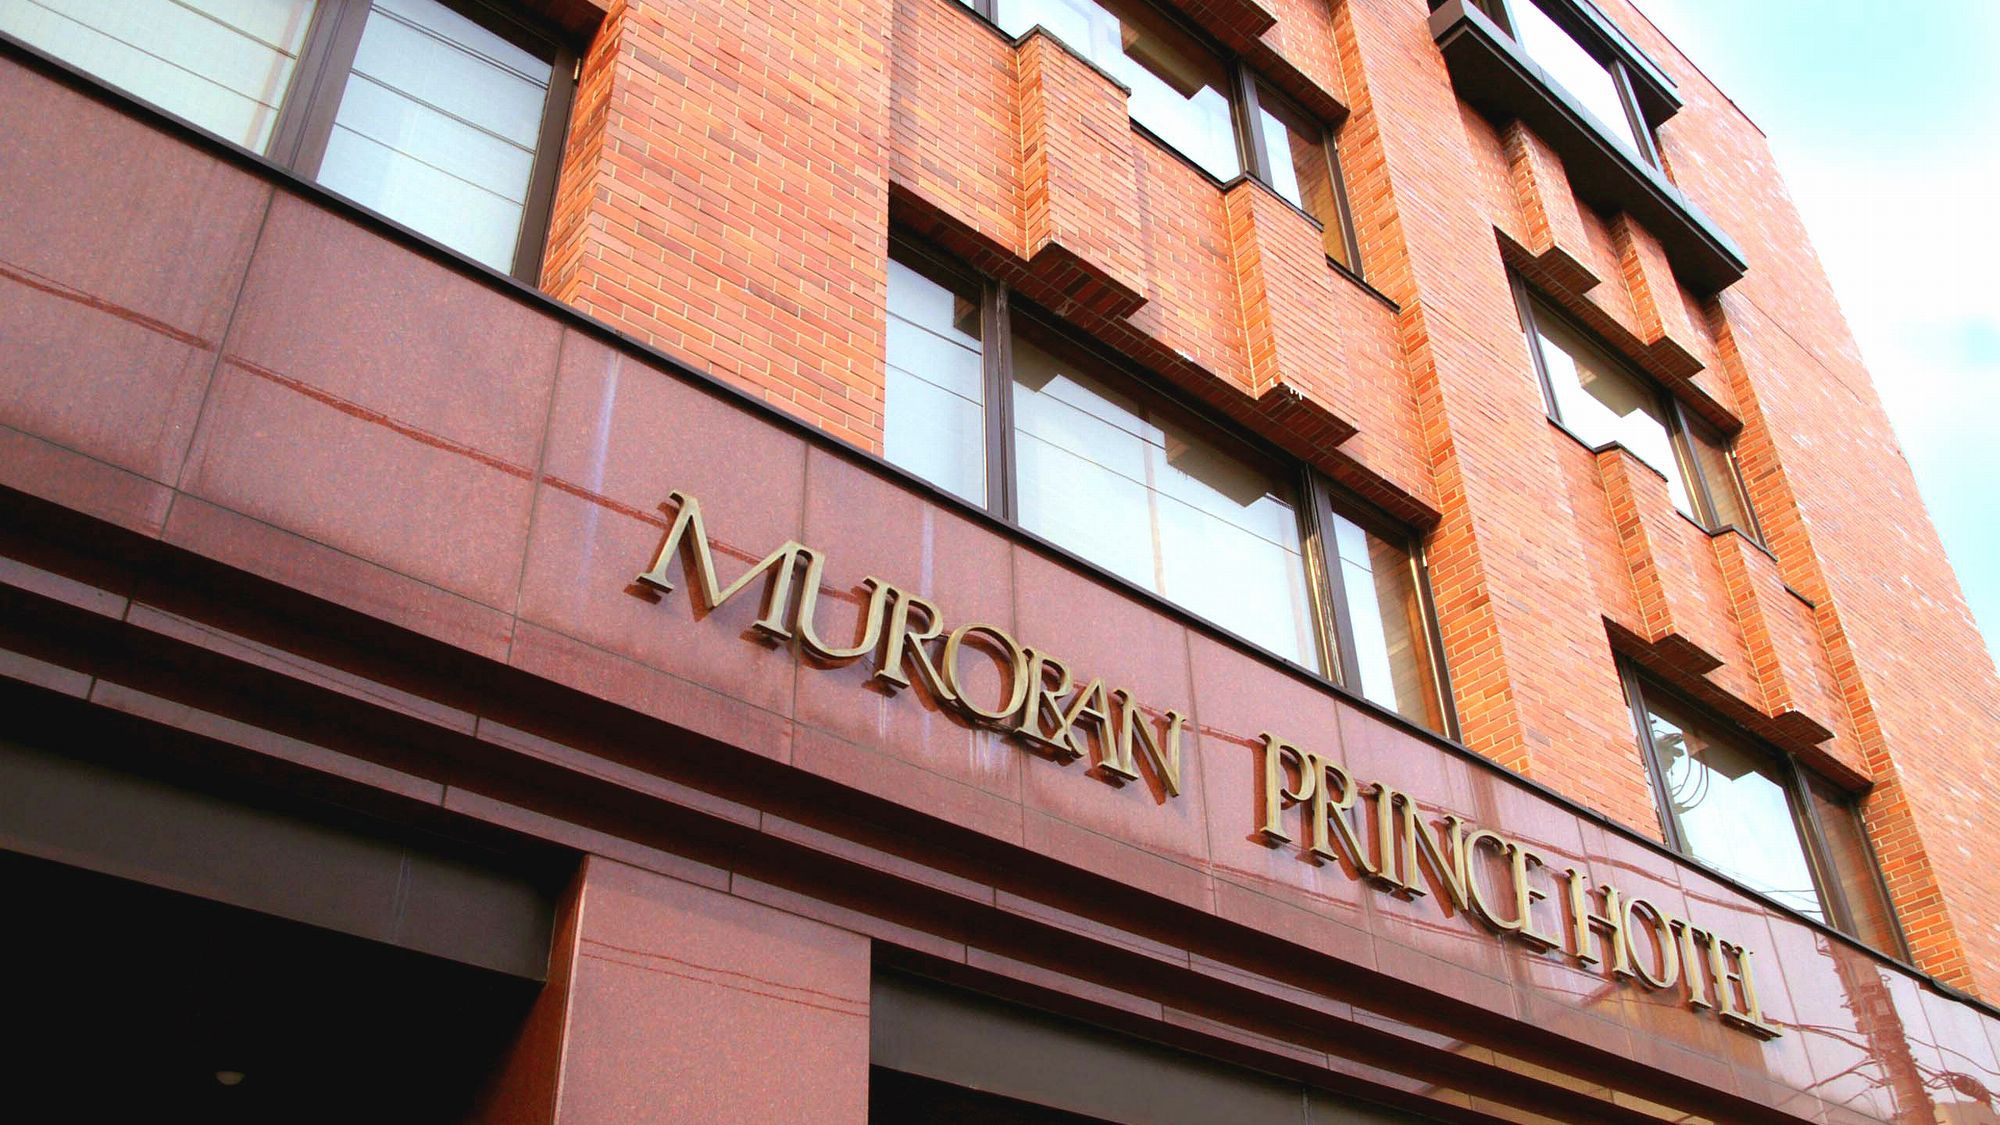 Muroran Prince Hotel